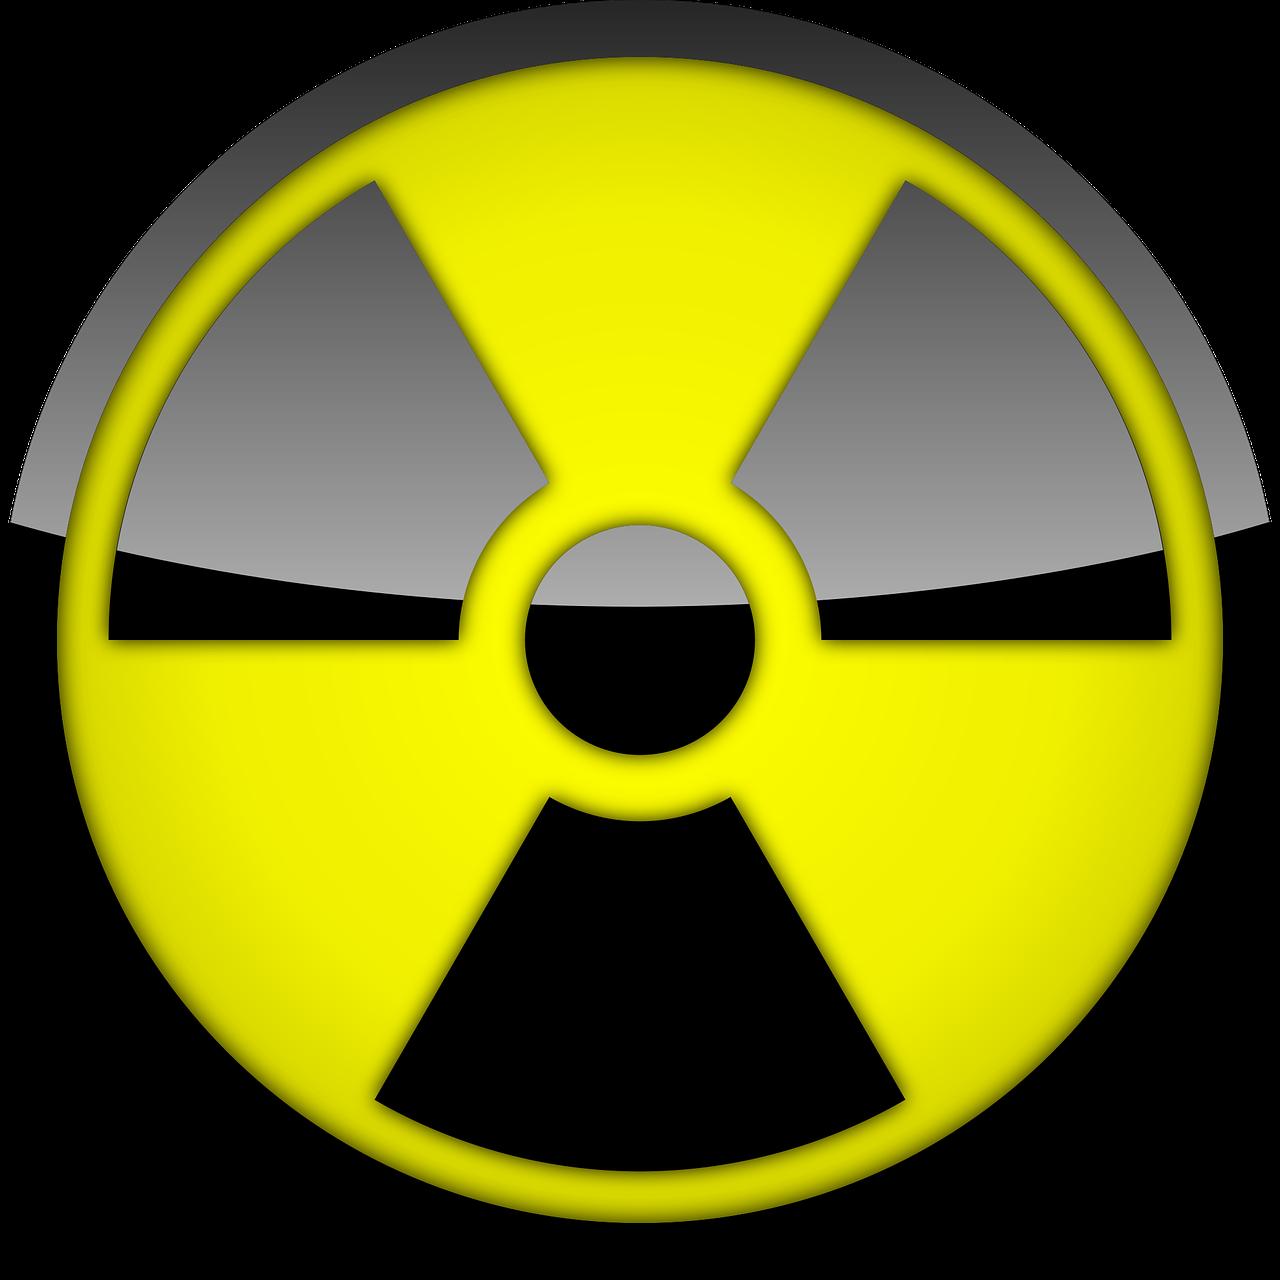 Radioactive clipart transparent picture royalty free Radioactive decay Hazard symbol Radiation Biological hazard ... picture royalty free